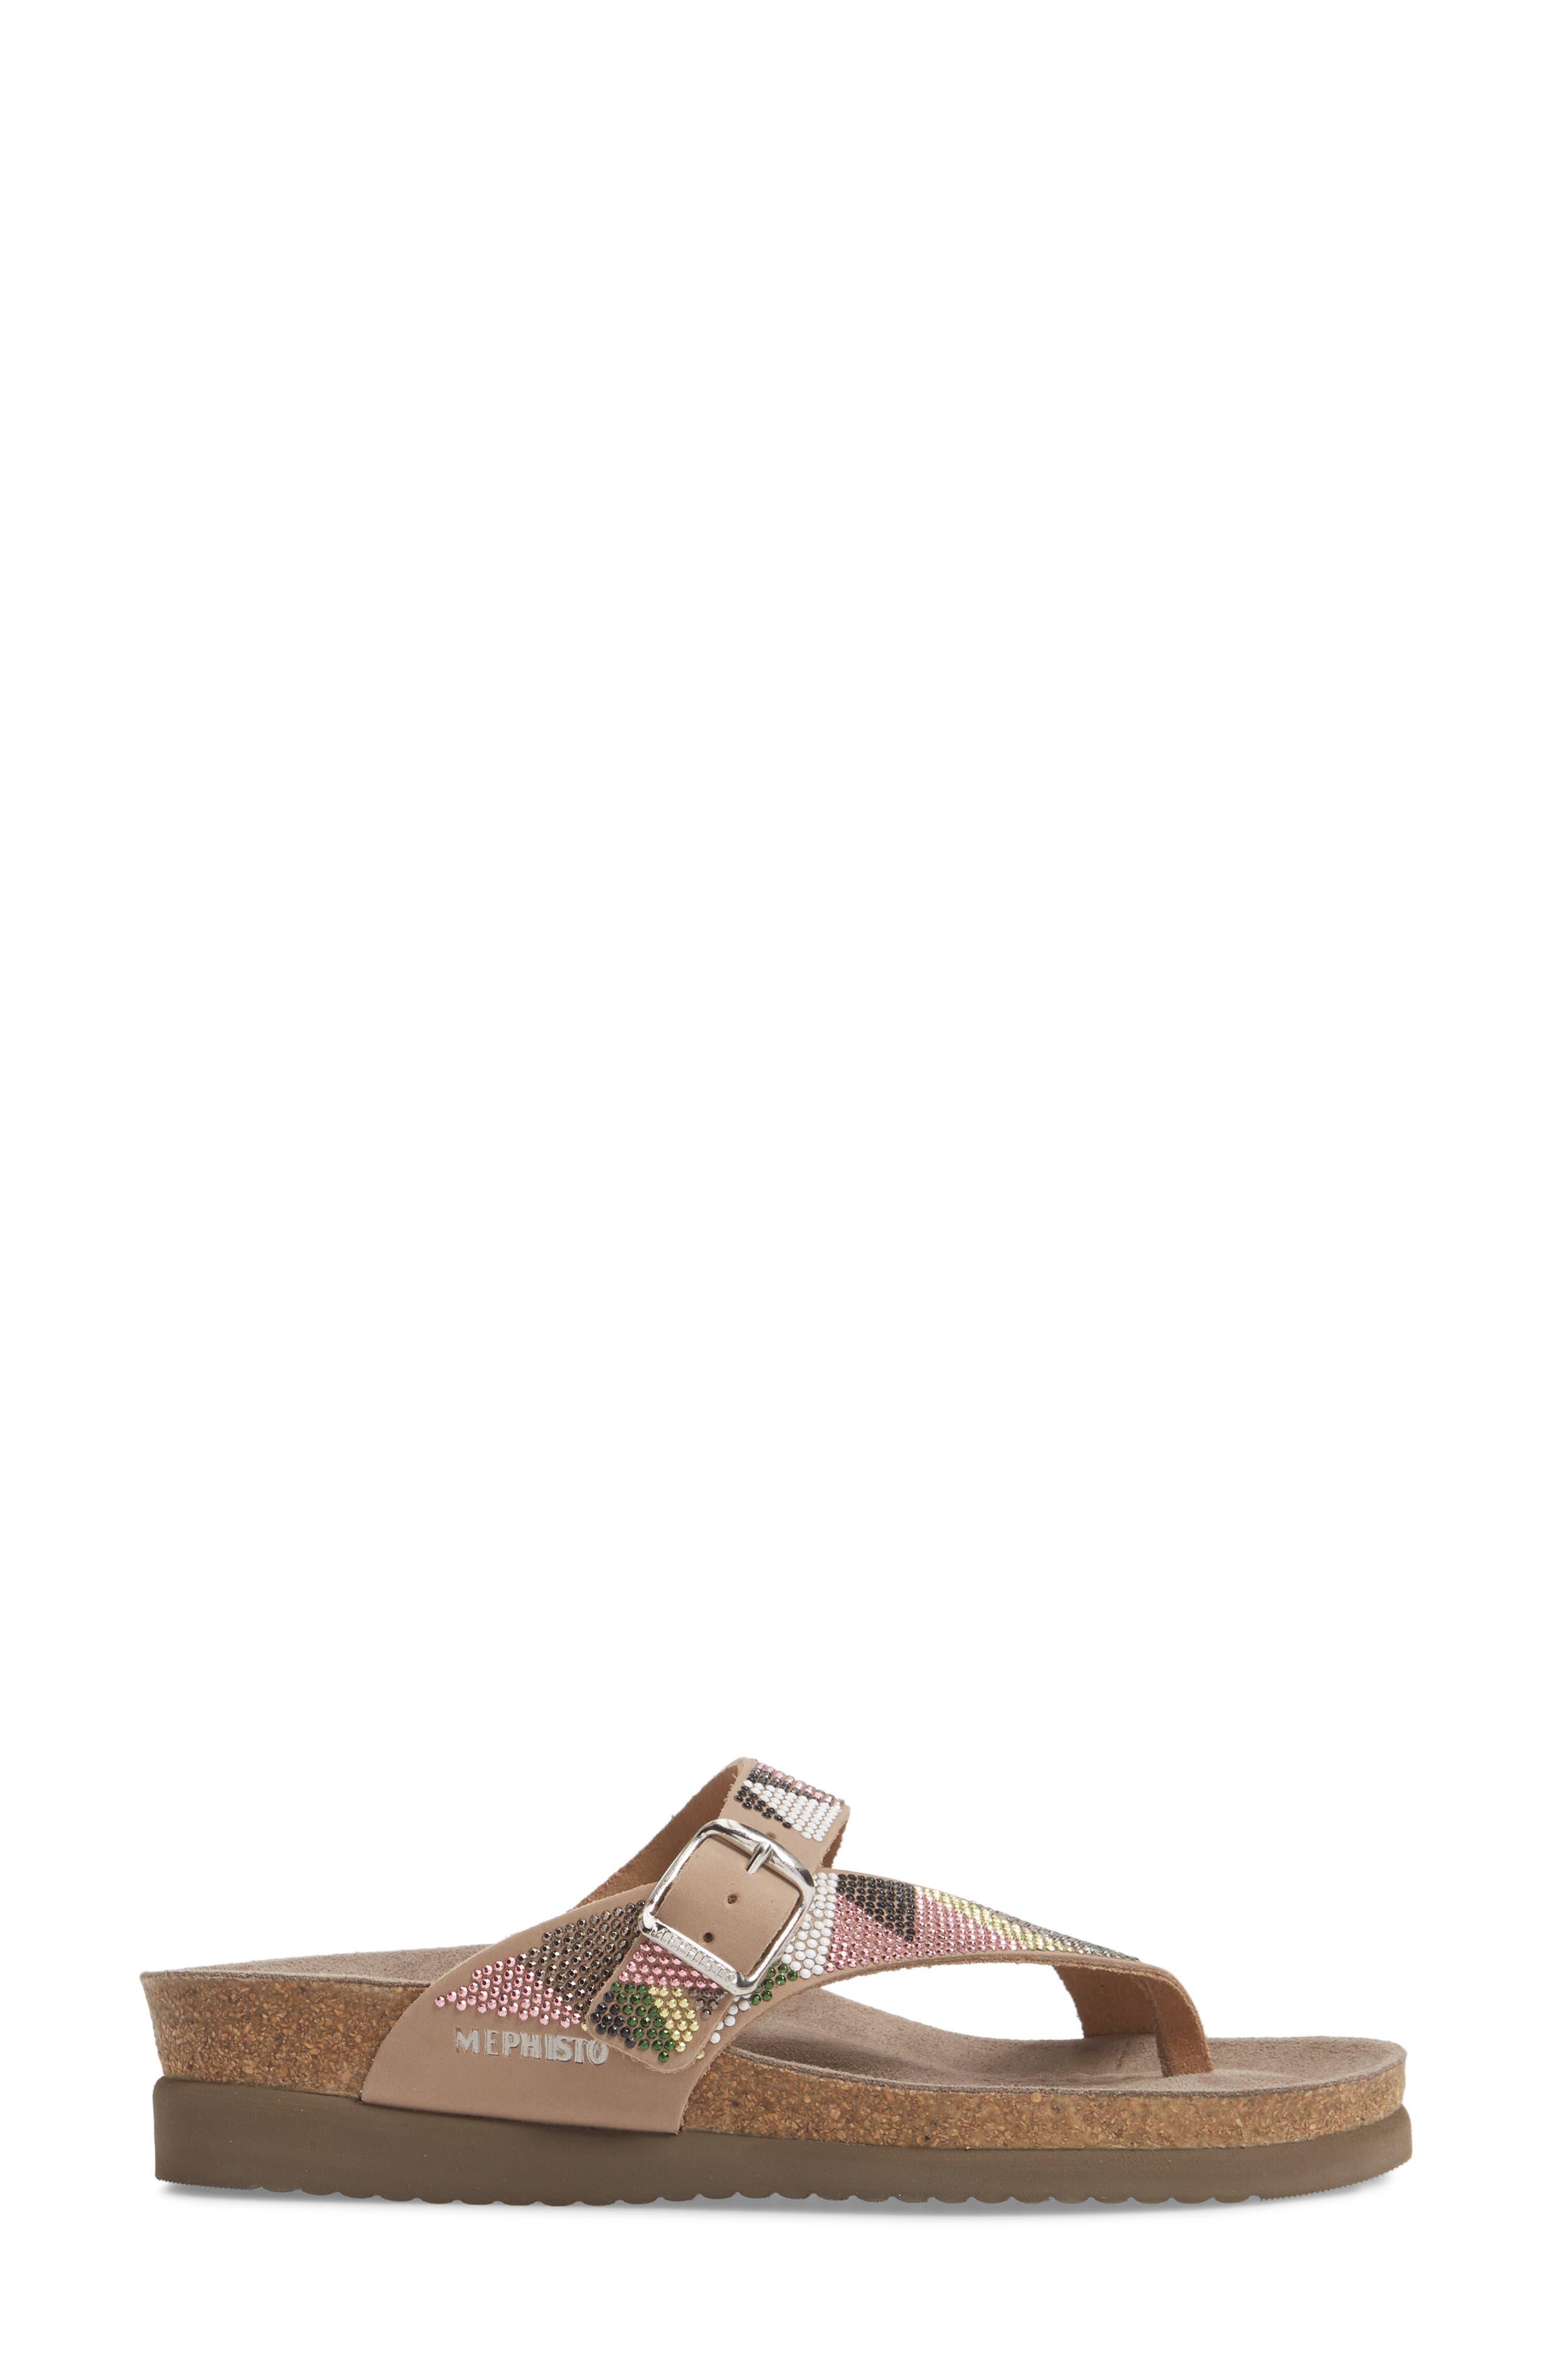 Helen Slide Sandal,                             Alternate thumbnail 3, color,                             Taupe/ Green/ Pink